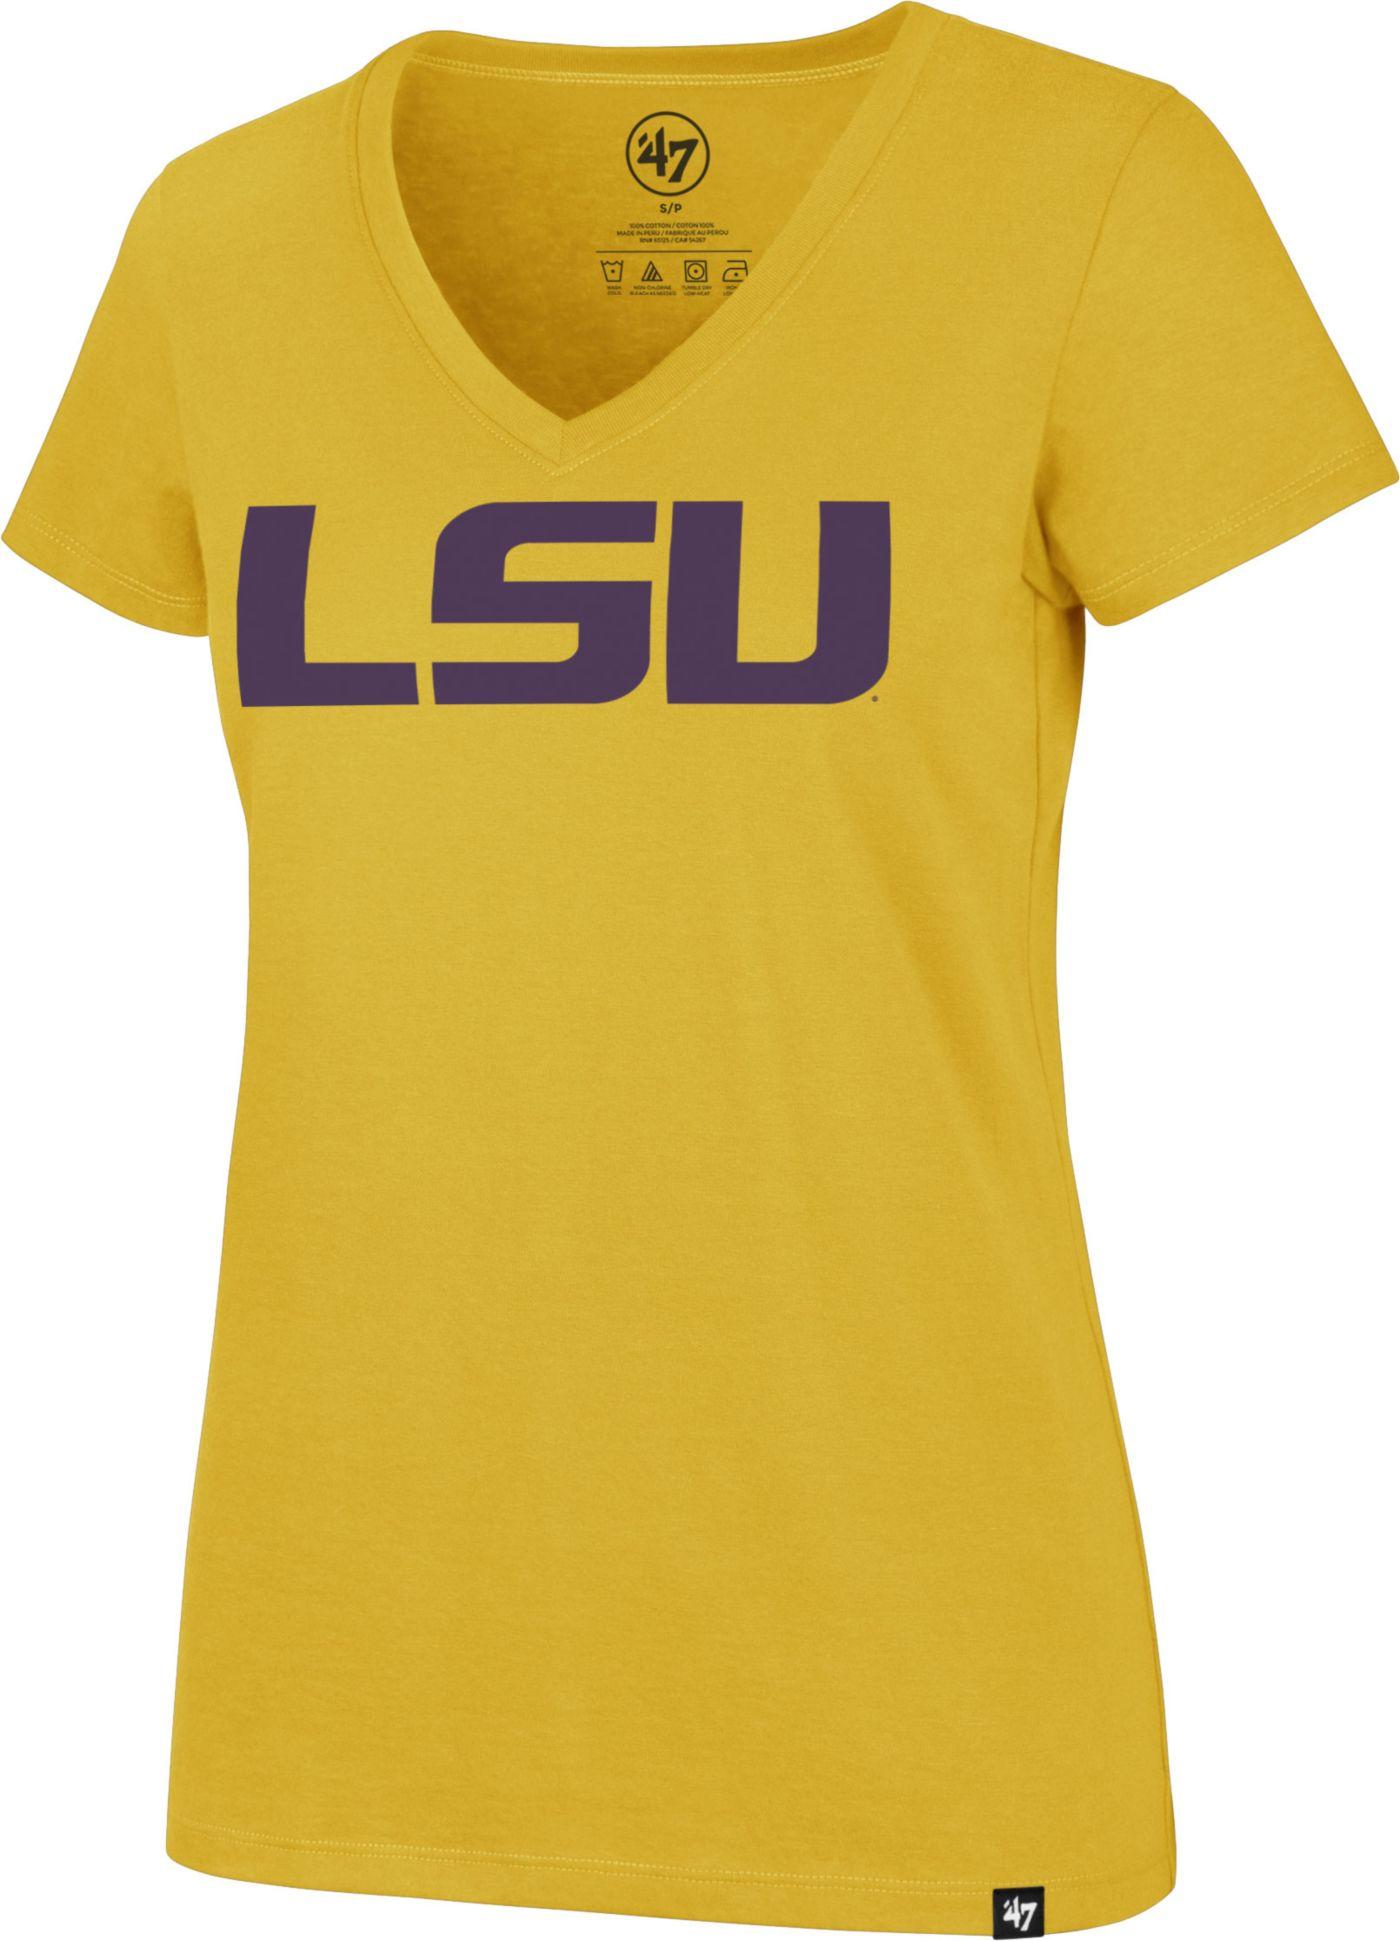 '47 Women's LSU Tigers Gold Rival V-Neck T-Shirt